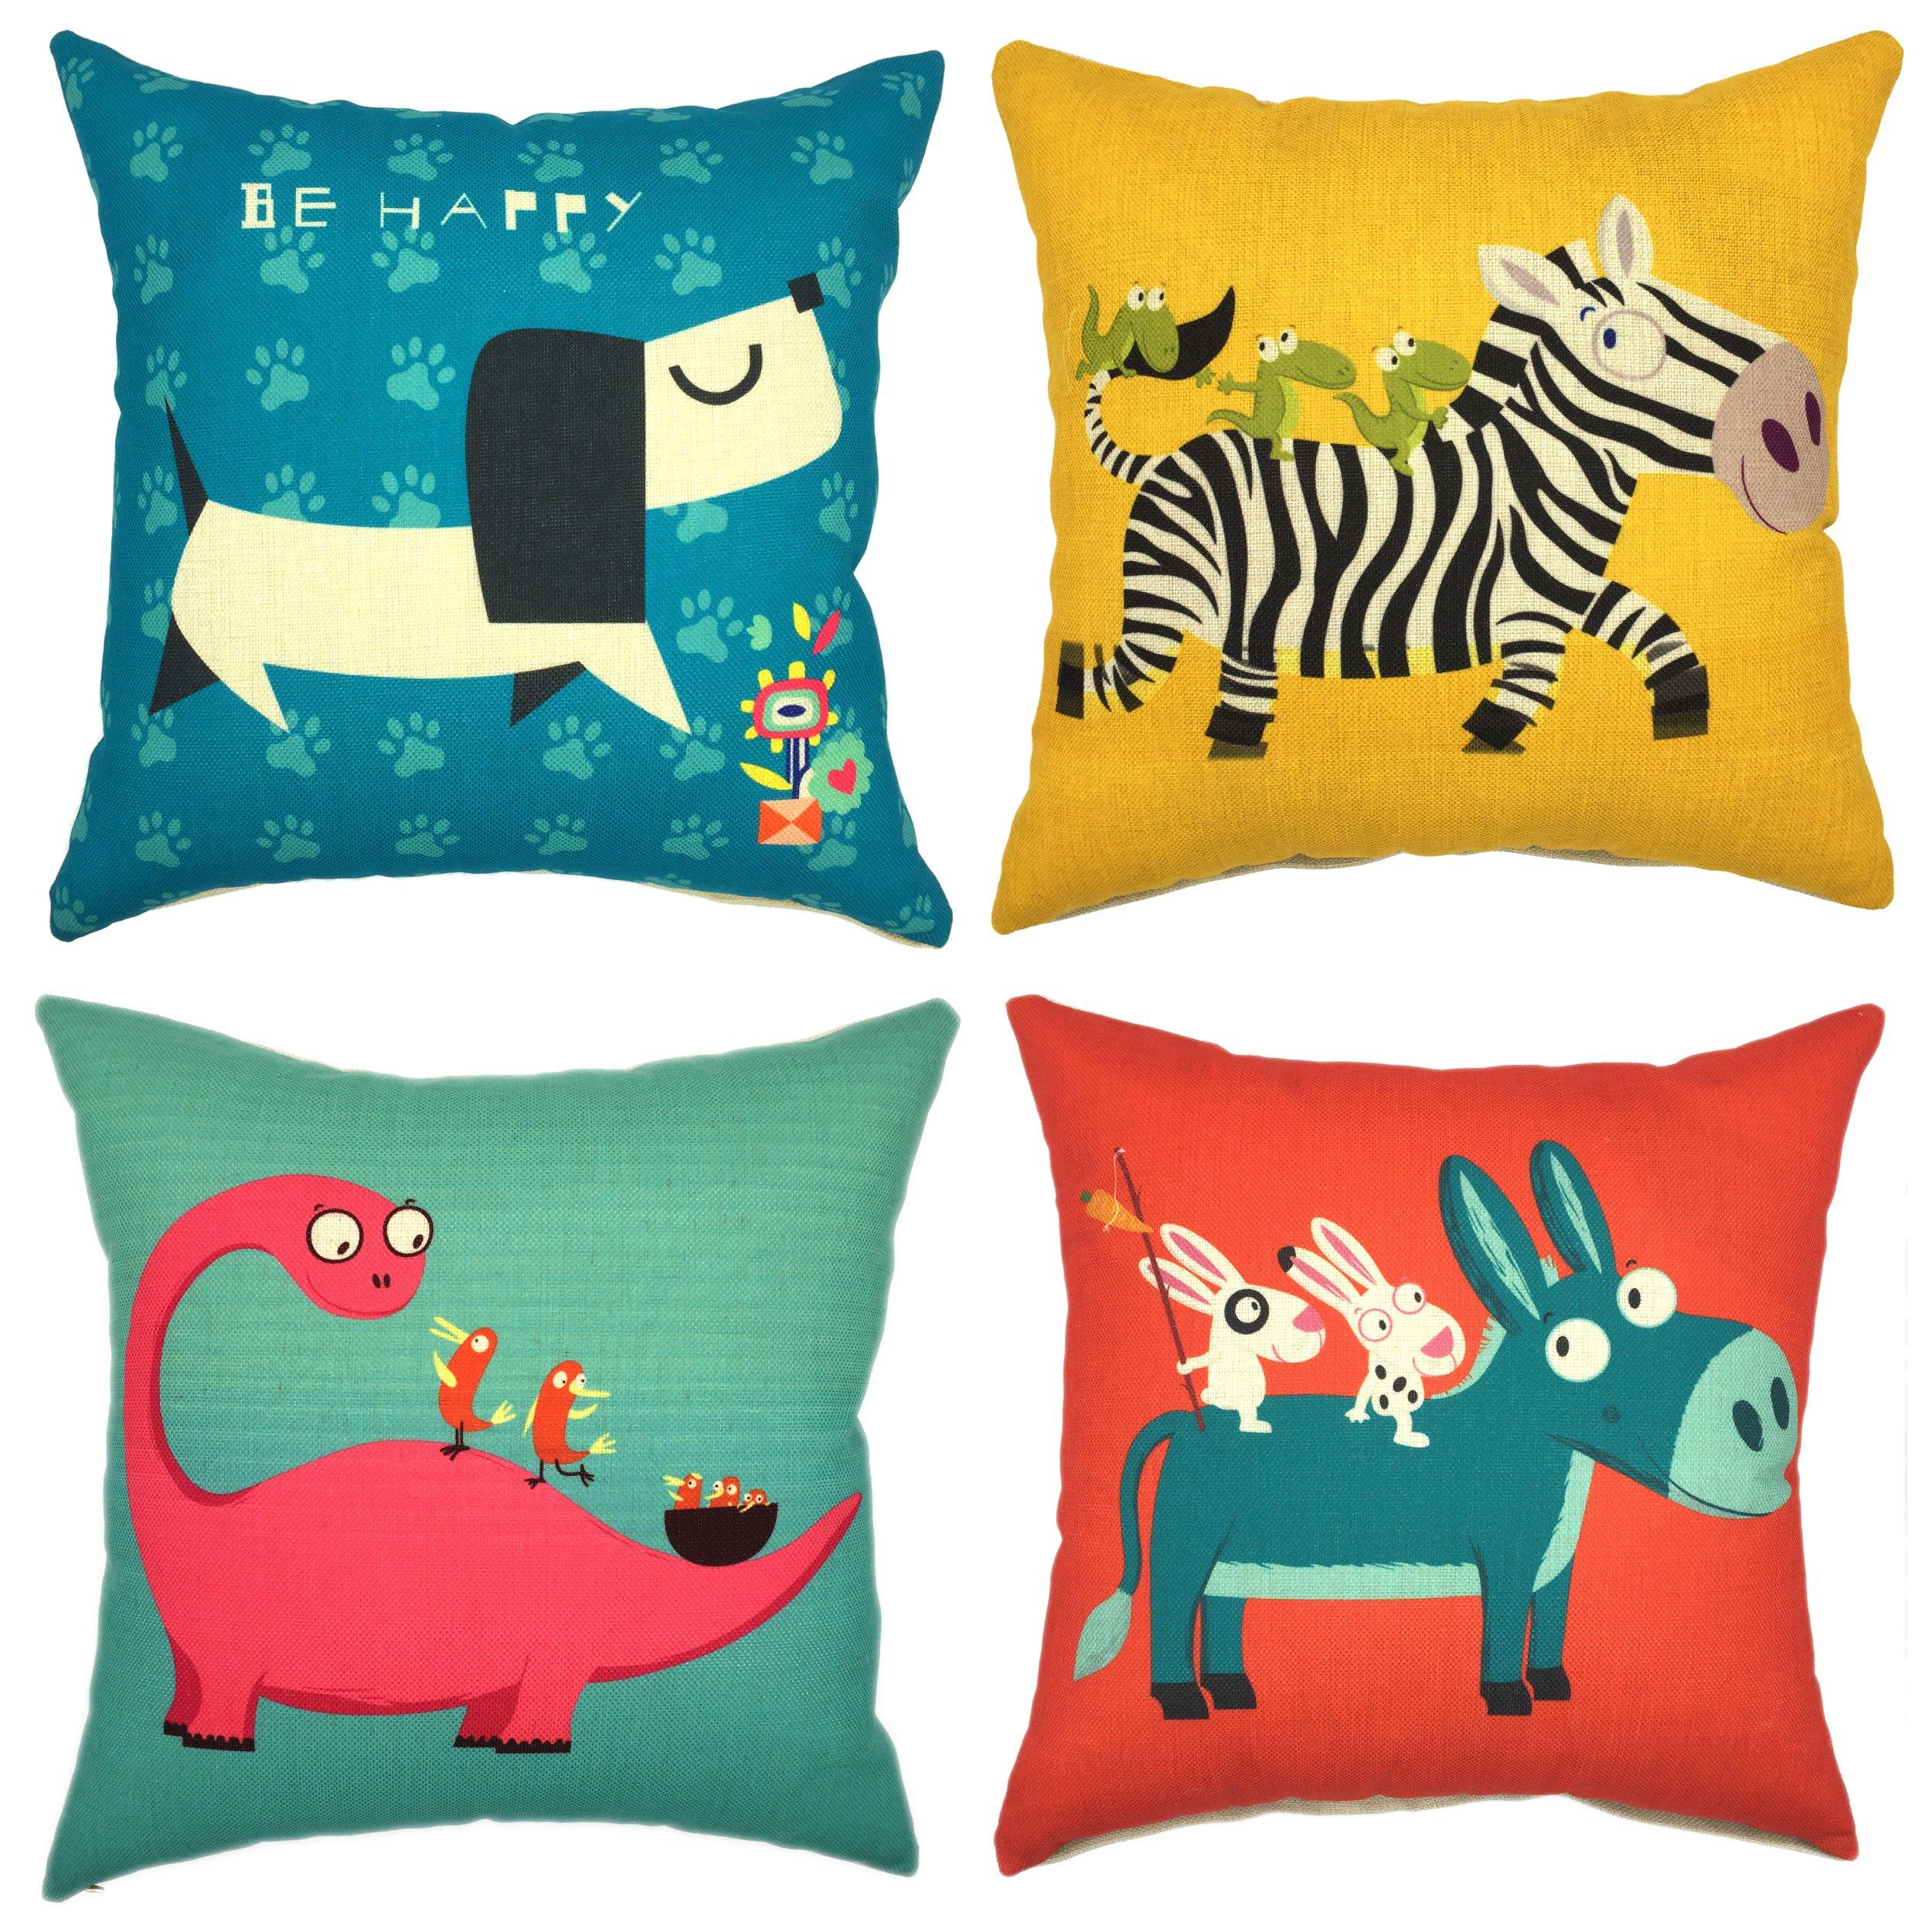 YOUR SMILE Cute Cartoon Animal Cotton Linen Decorative Throw Pillow Case Cushion Cover Pillowcase Sofa 18 x 18 inch, Set of 4